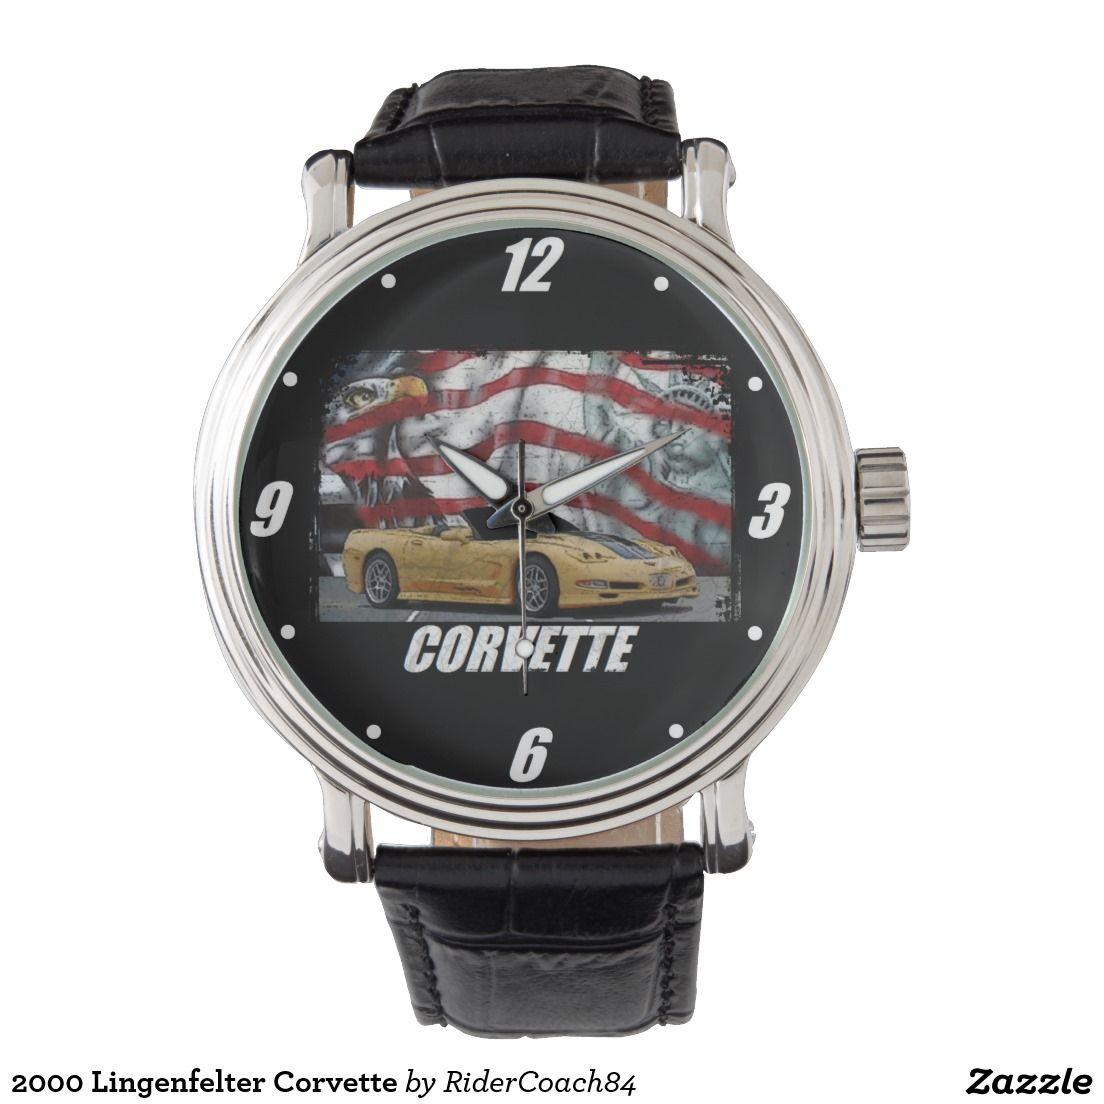 2000 Lingenfelter Corvette Wrist Watches